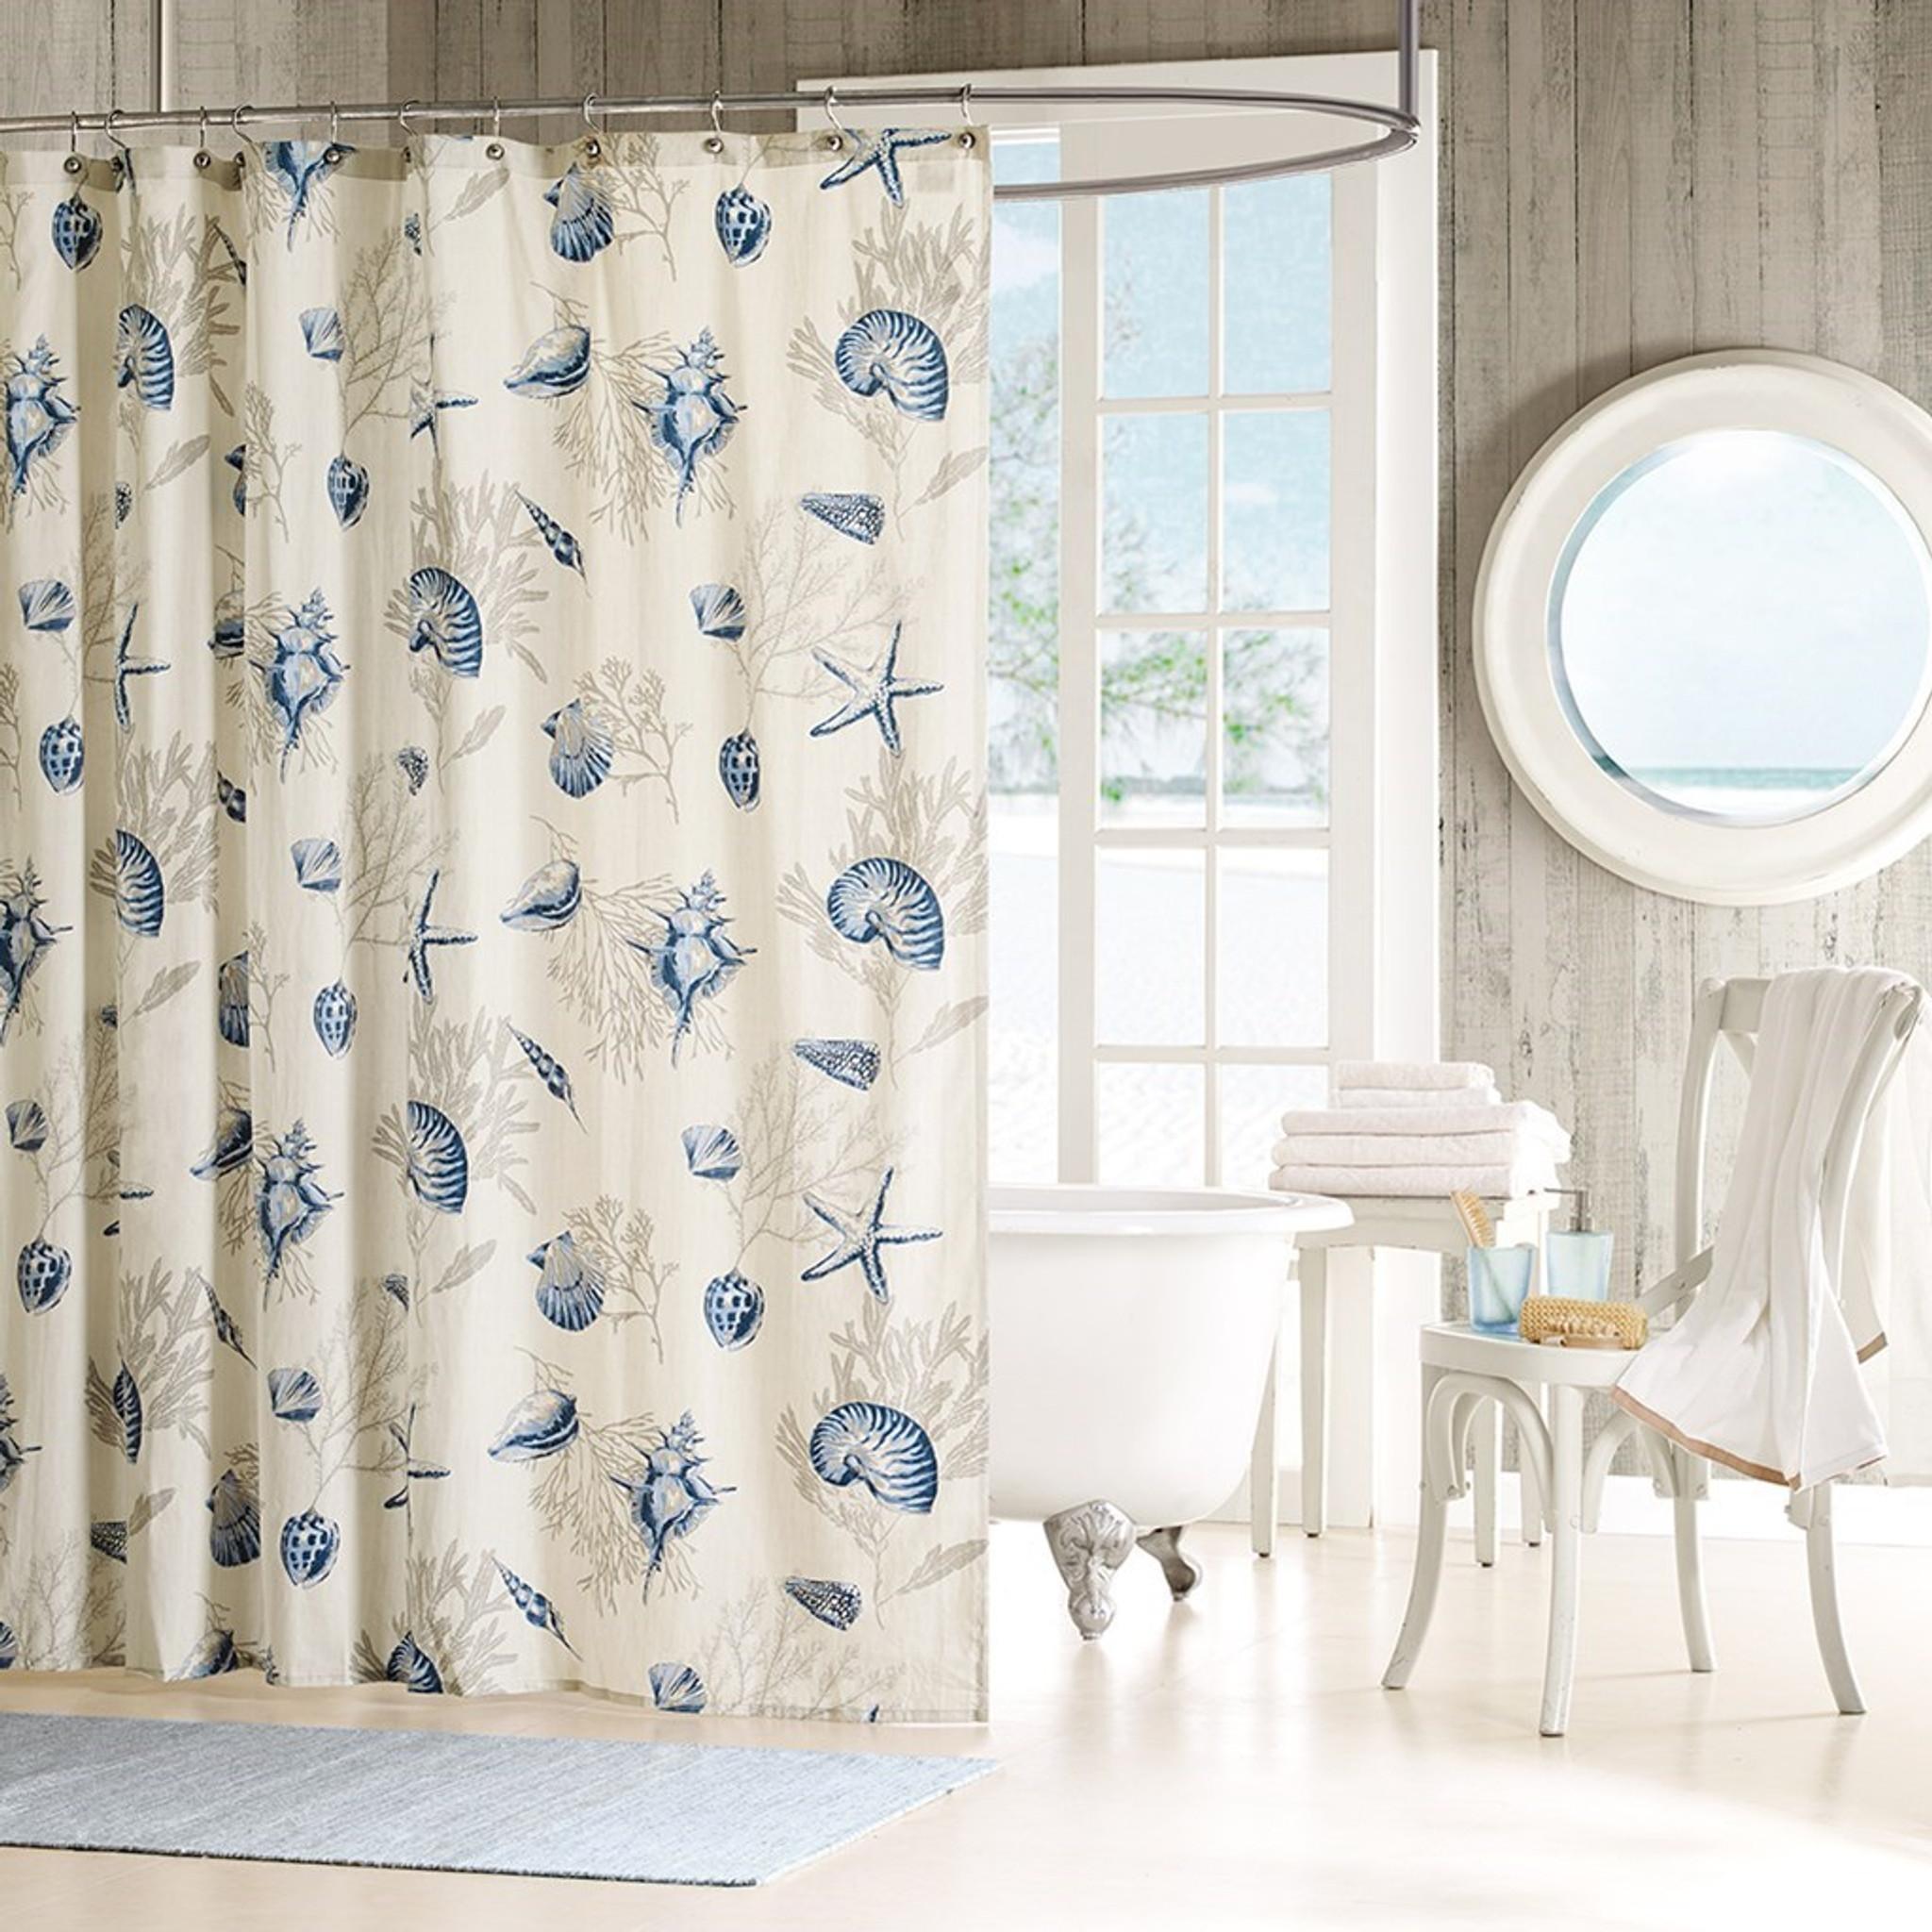 bayside shells shower curtain